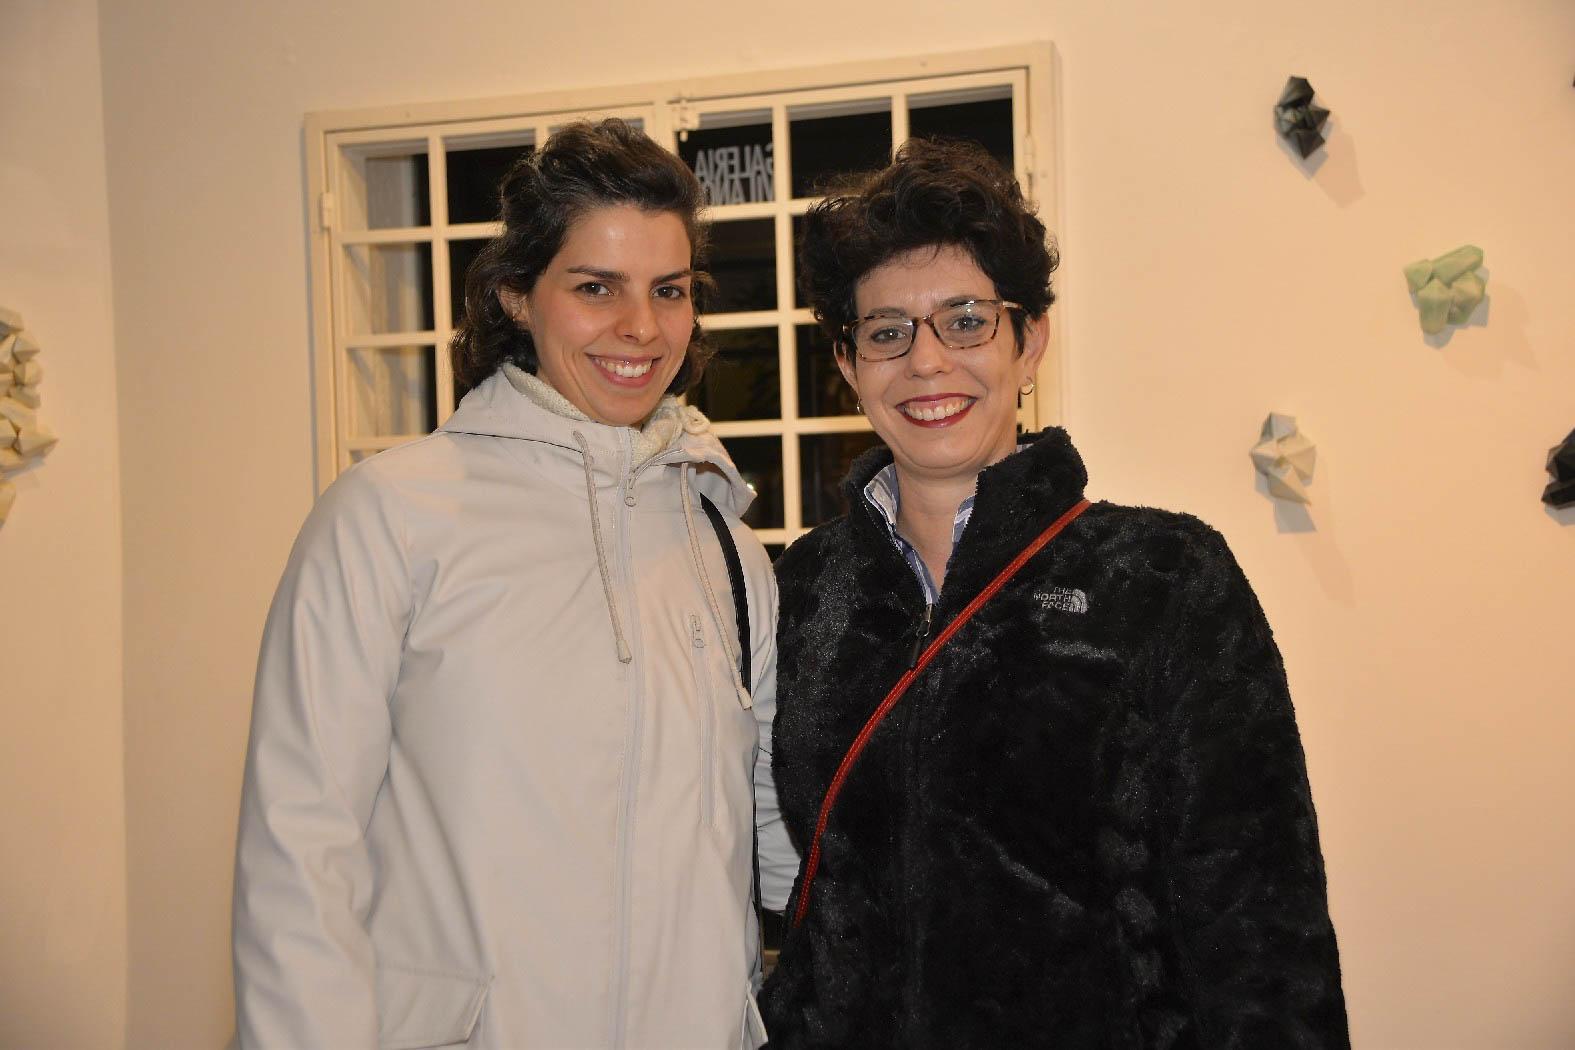 Fernanda Papa de Boer e Camila Alvite (3)